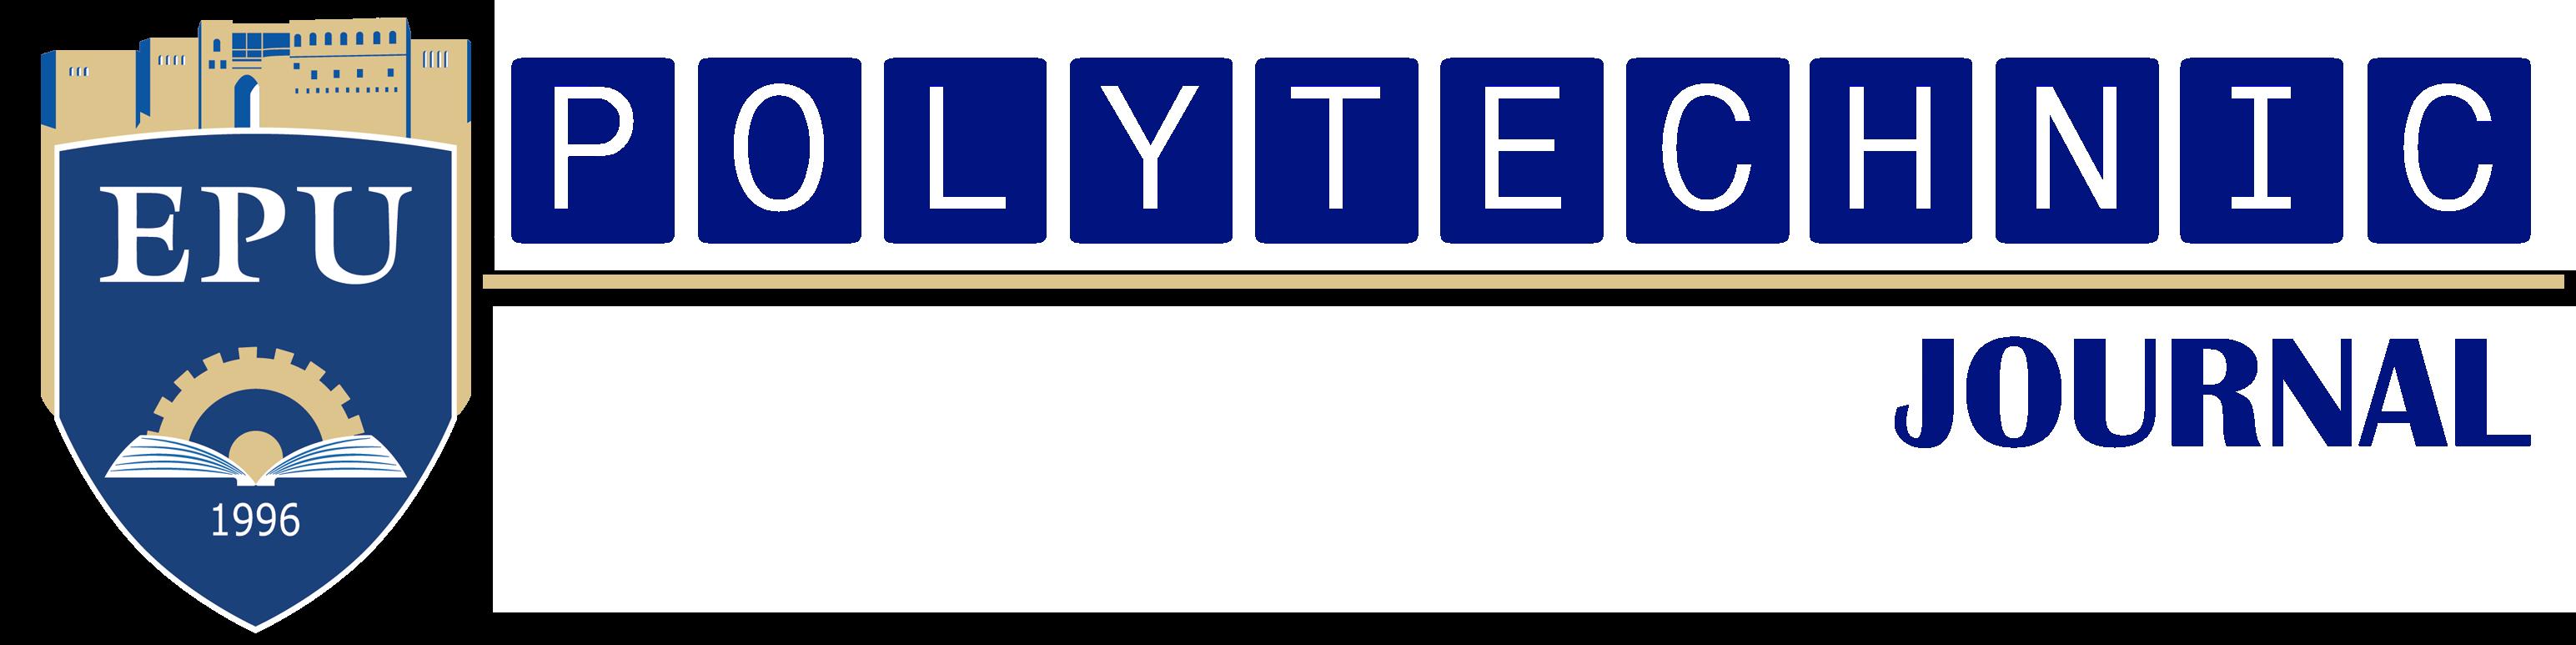 Polytechnic Journal